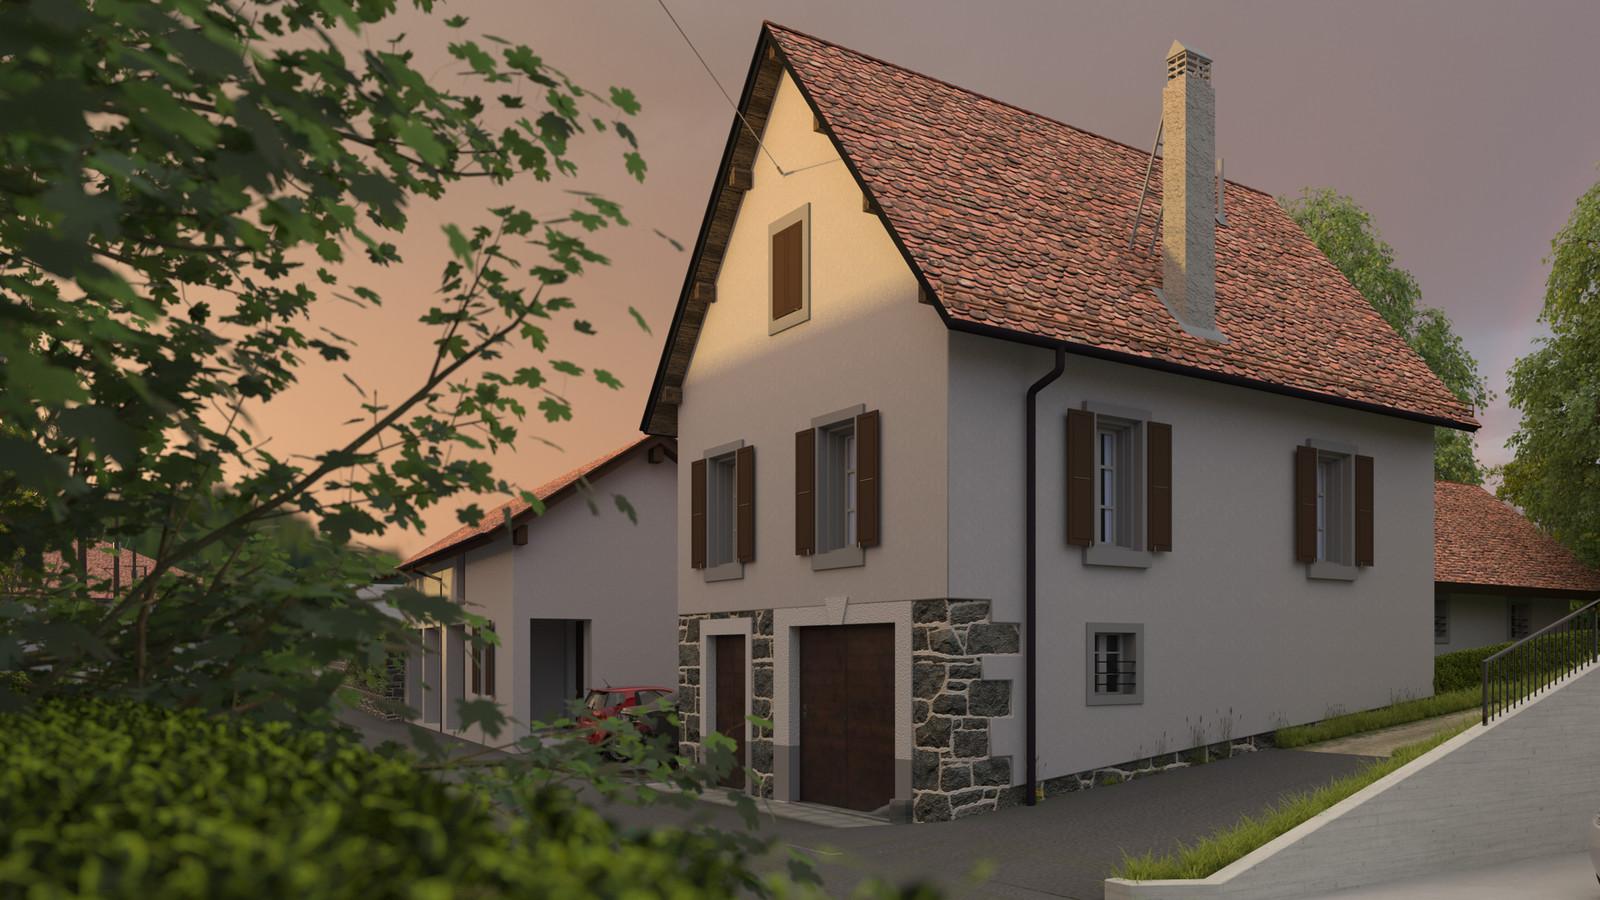 SketchUp + Thea Render  Little Swiss House Scene 28 250-hdri-skies 01 HD 1920 x 1080 Presto MC  HDR by HDRI-SKIES found here: http://hdri-skies.com/shop/hdri-sky-250/